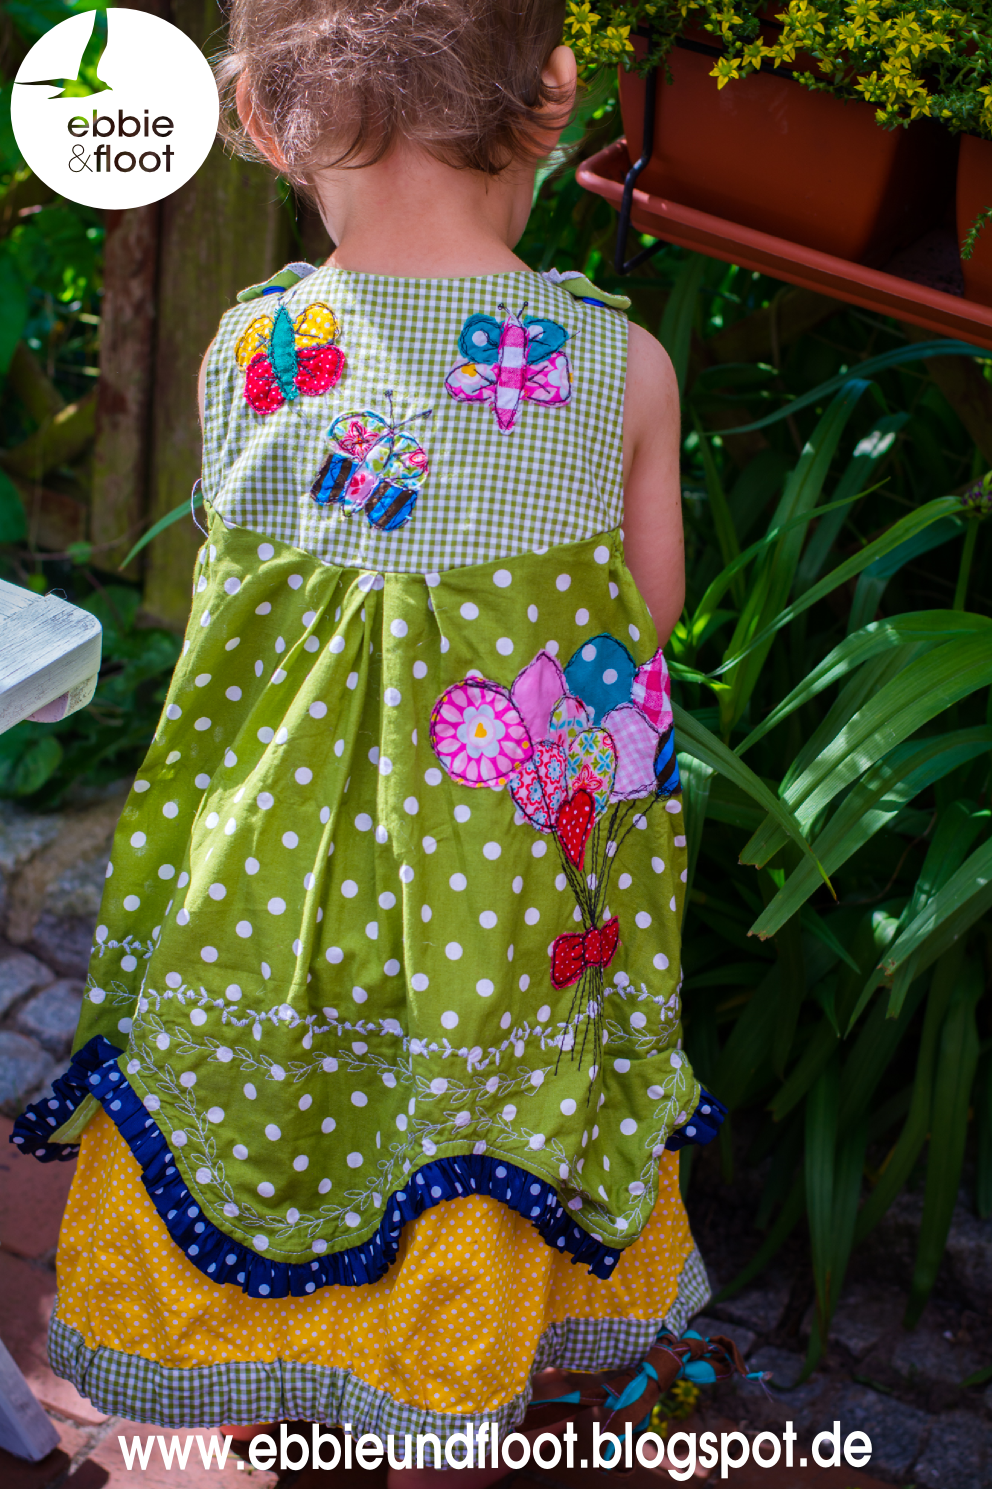 ebbie und floot_farbenmix_Cara_Kleid_Dress_birthday dress_Cake_Ballon_ribbons_ruffels_green_dots_05